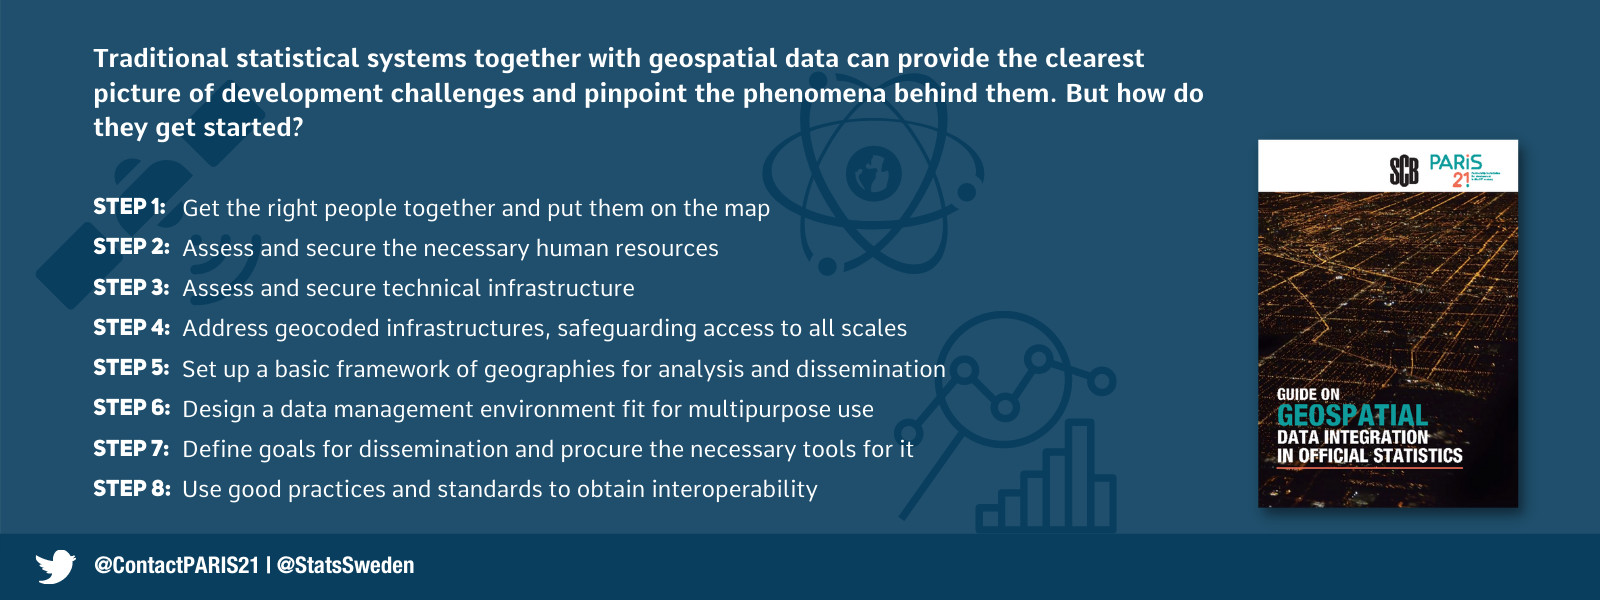 geospatial data integration